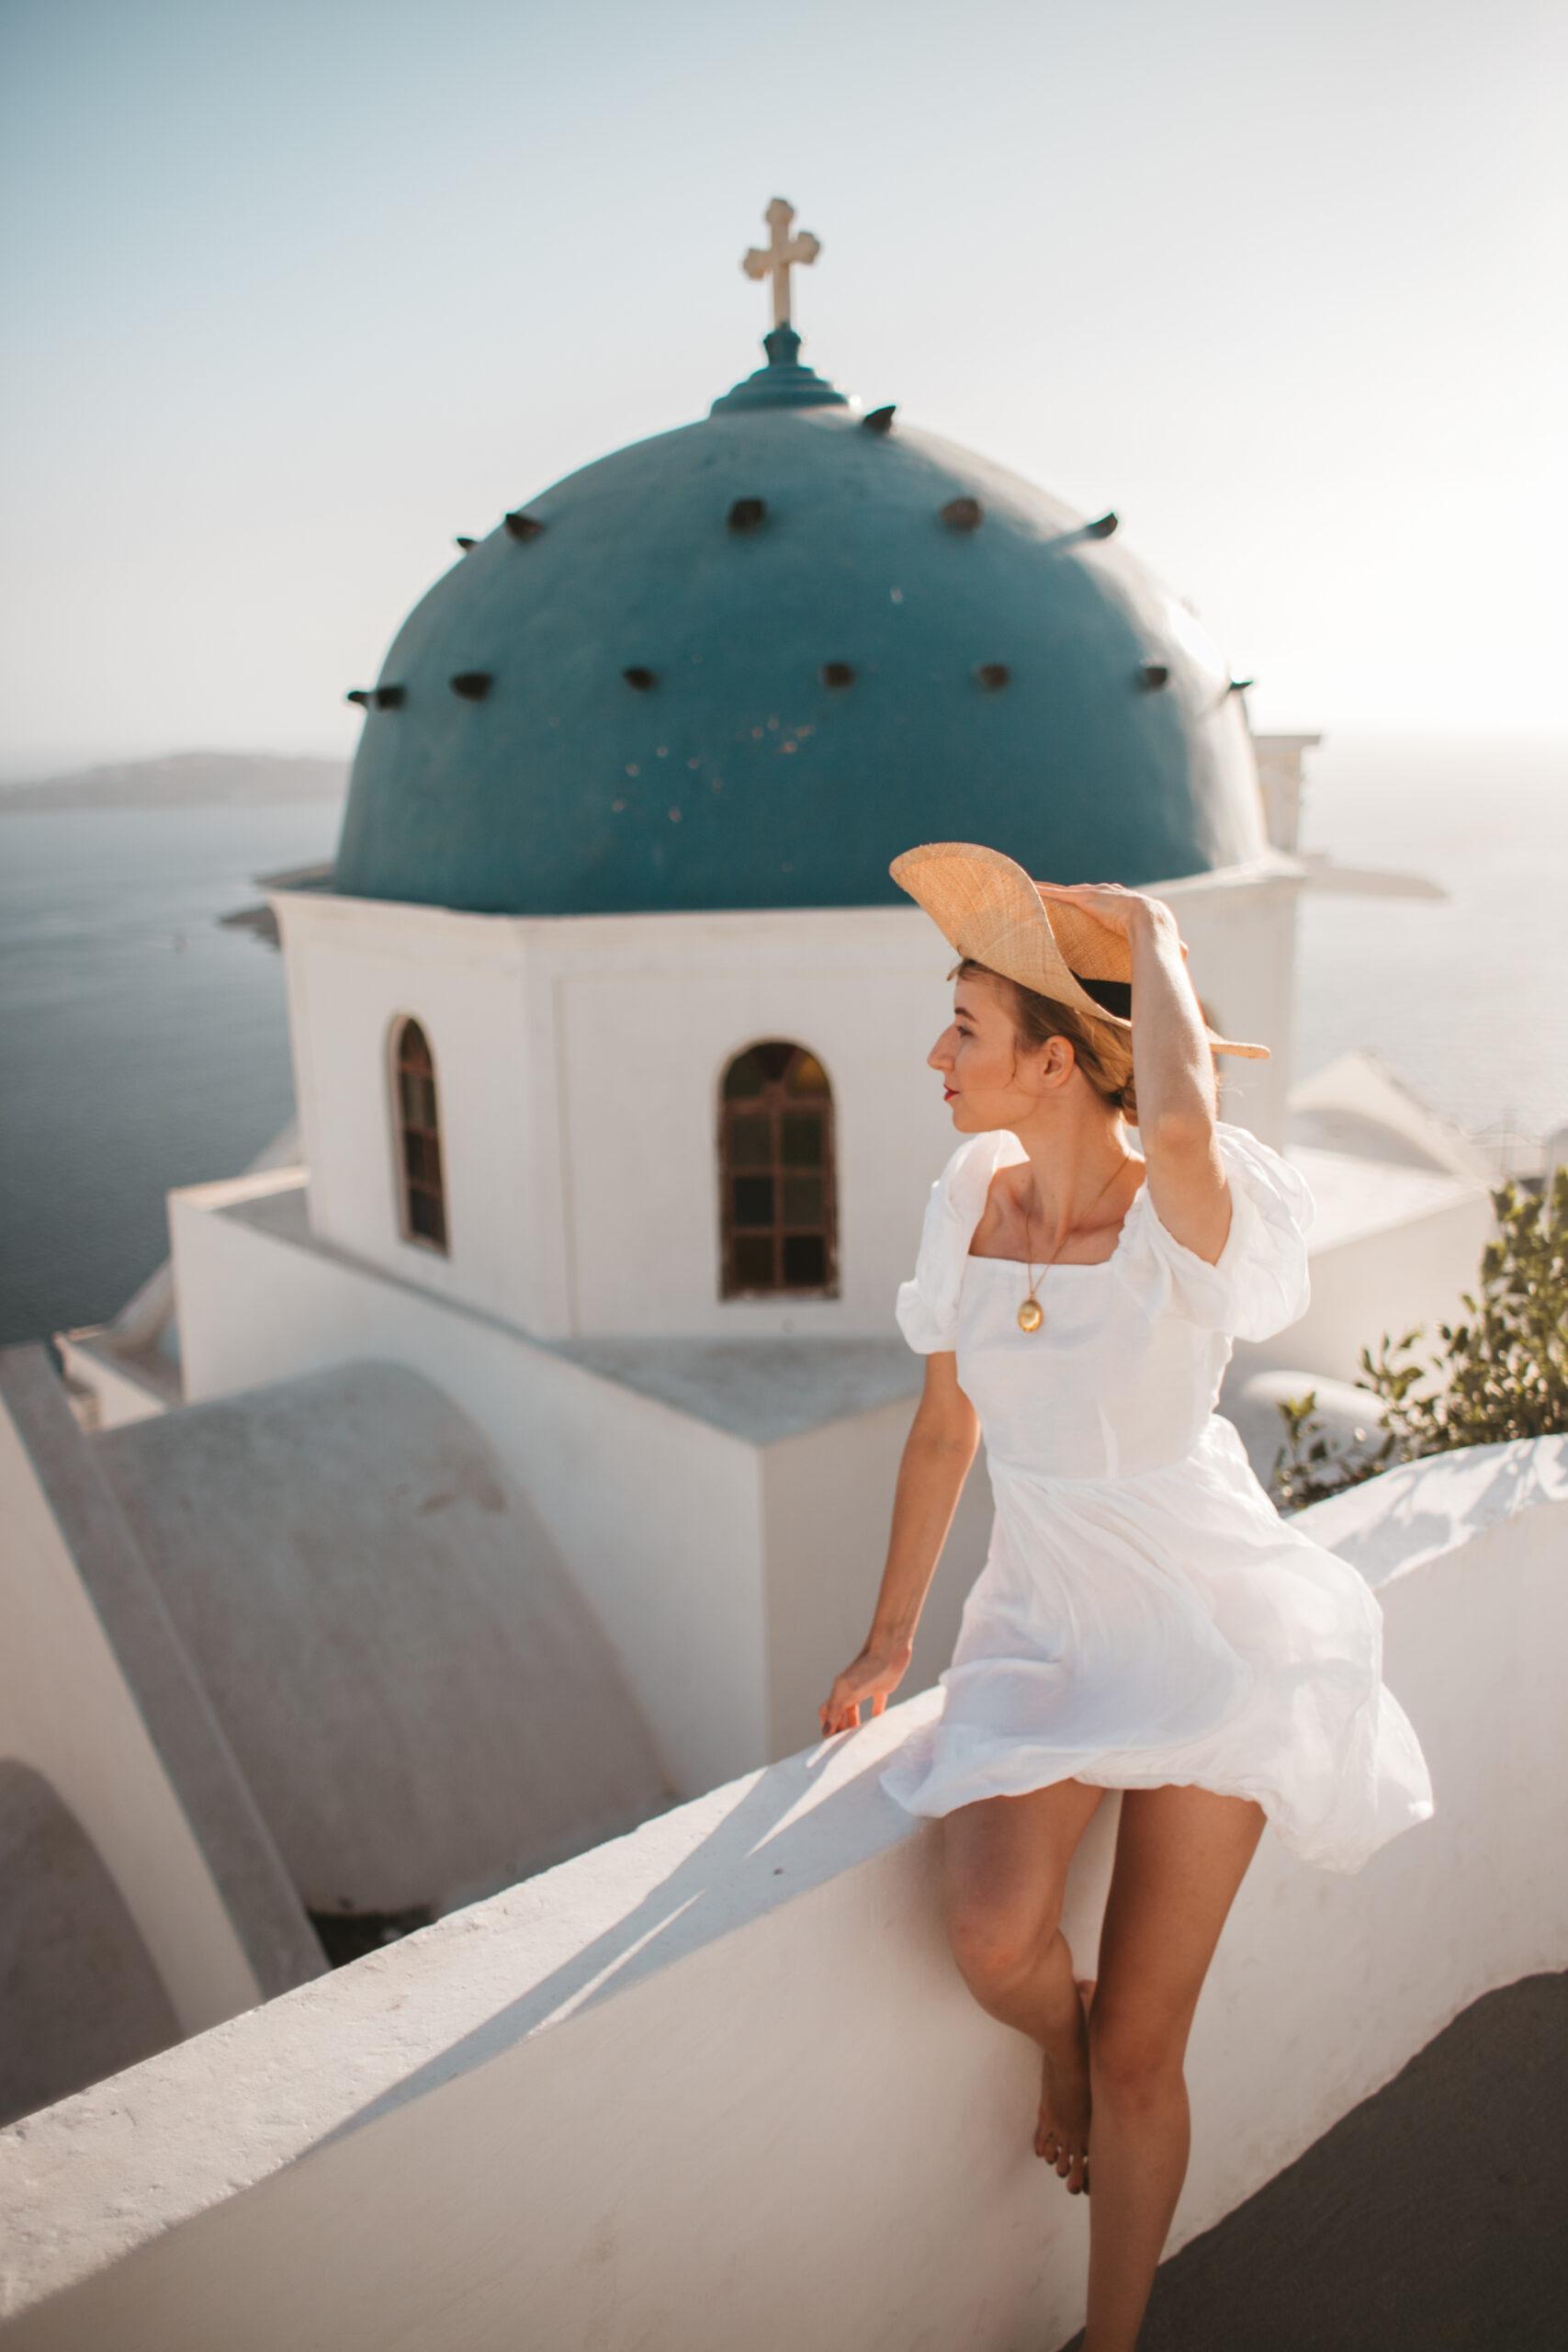 Santorini widok, Imerovigli blue dome, Anastasis Church, blogerka podroznicza, blog podrozniczy